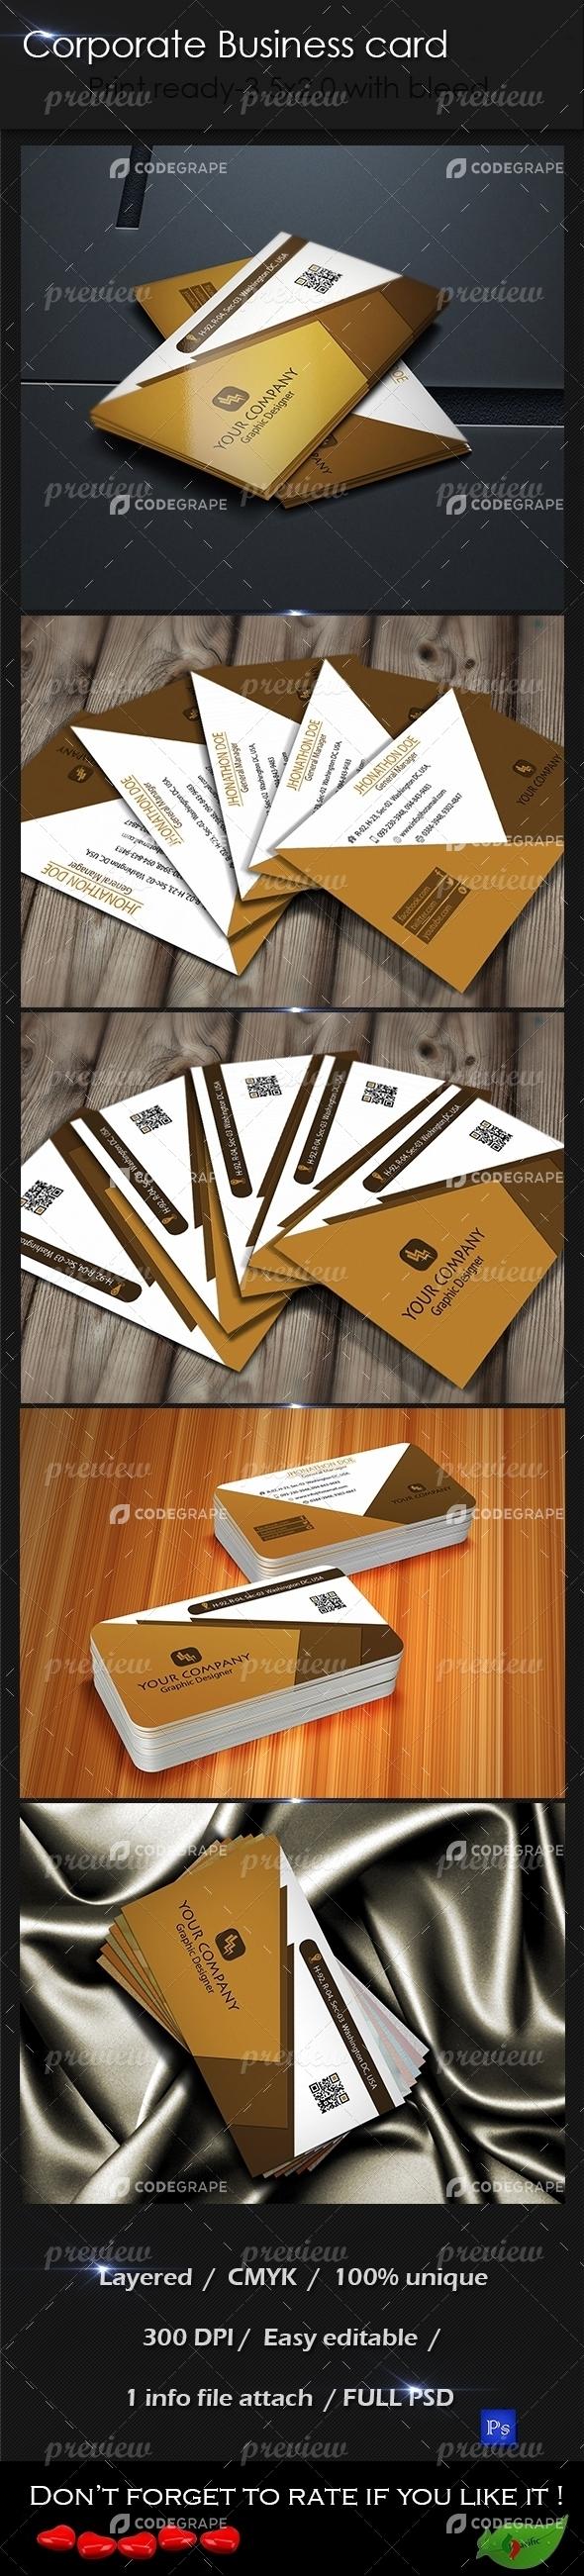 Corporate Business Card 10